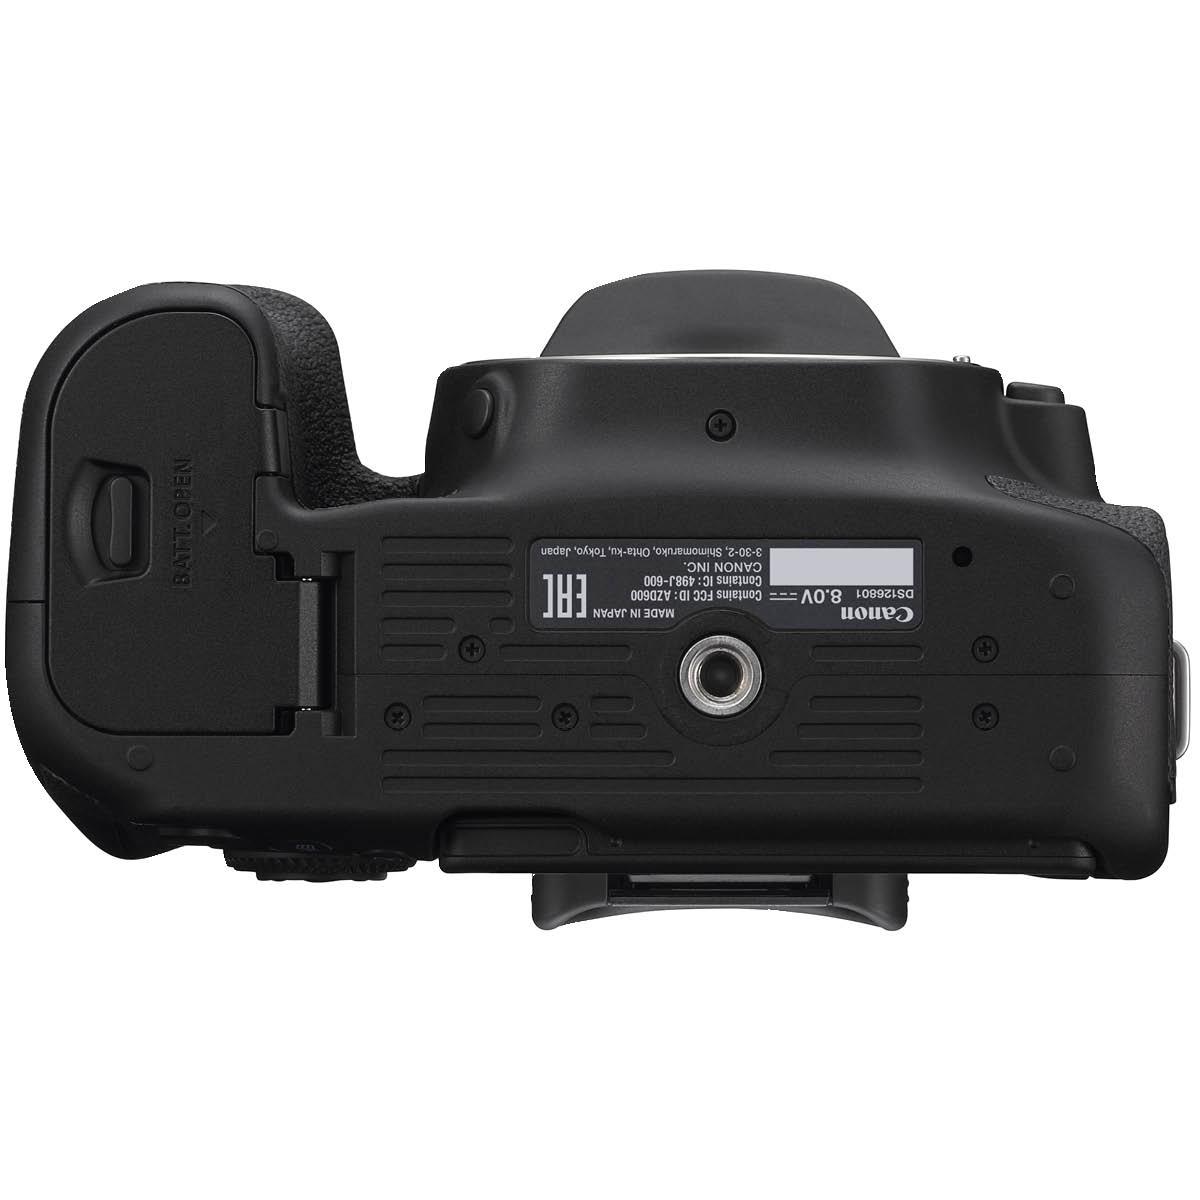 Canon EOS 90D Kit mit 18-135 mm 1:3,5-5,6